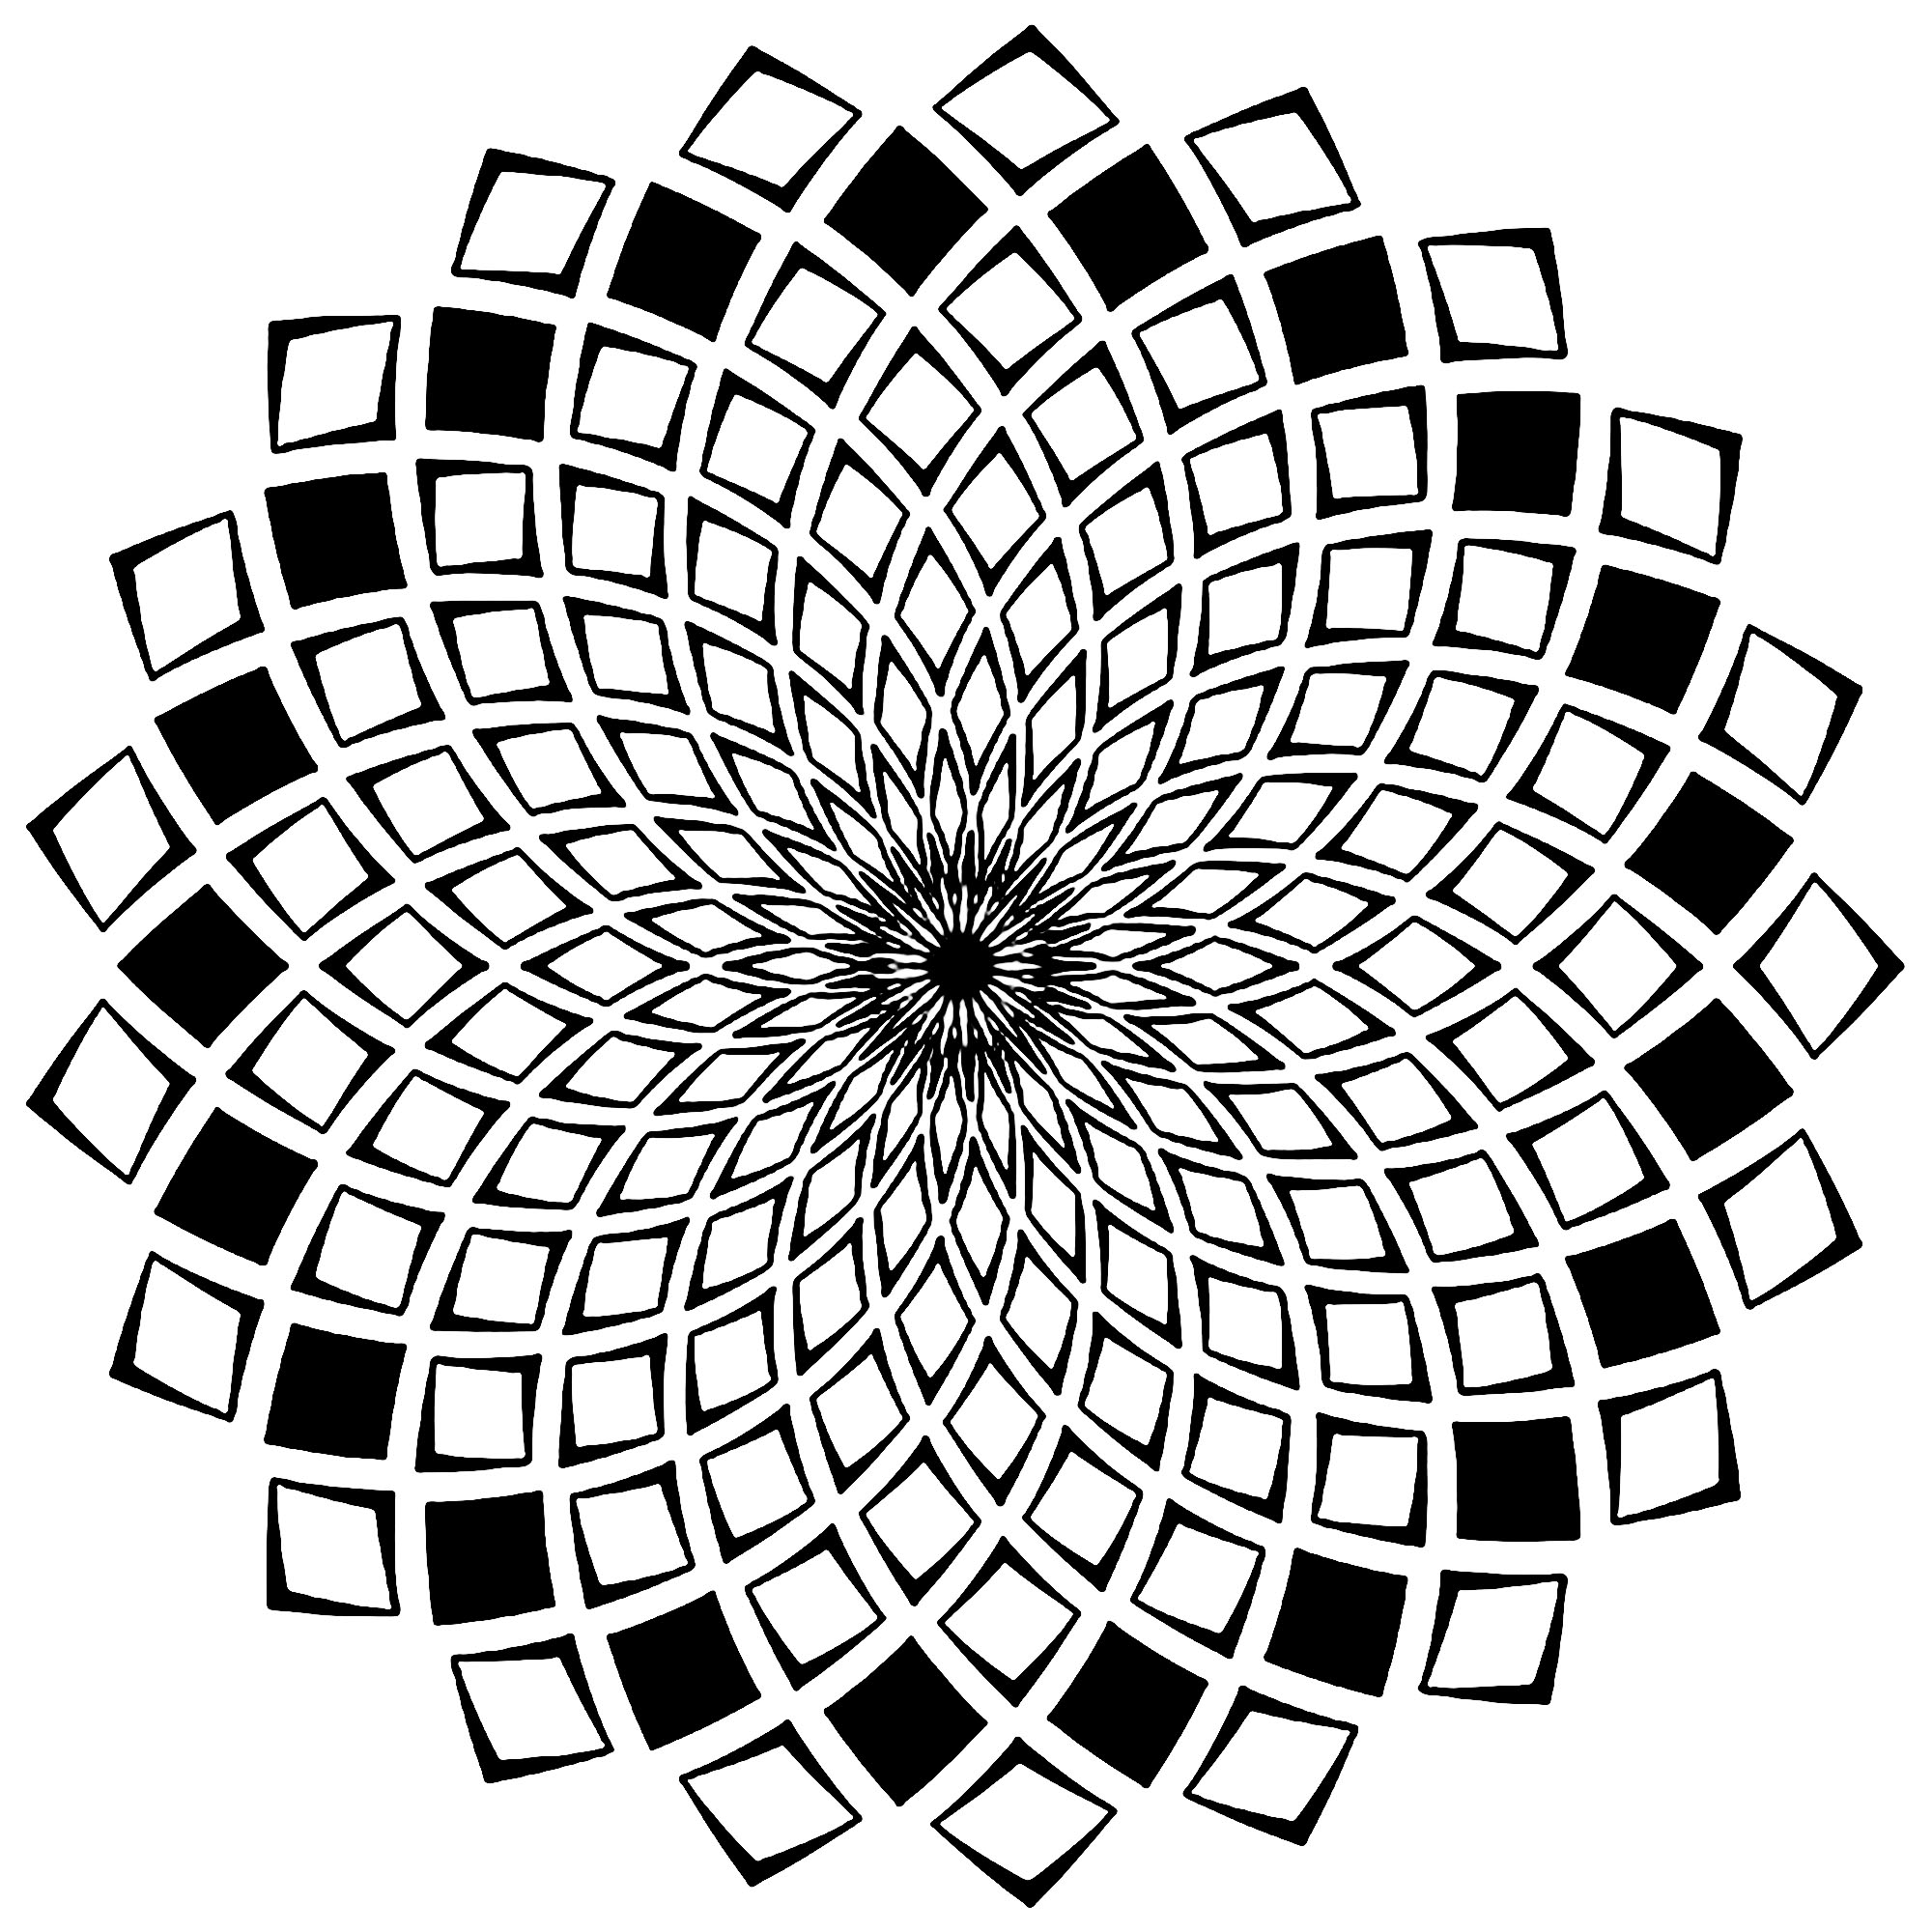 Mandala squares mandalas with geometric patterns 100 for Geometric mandala coloring pages